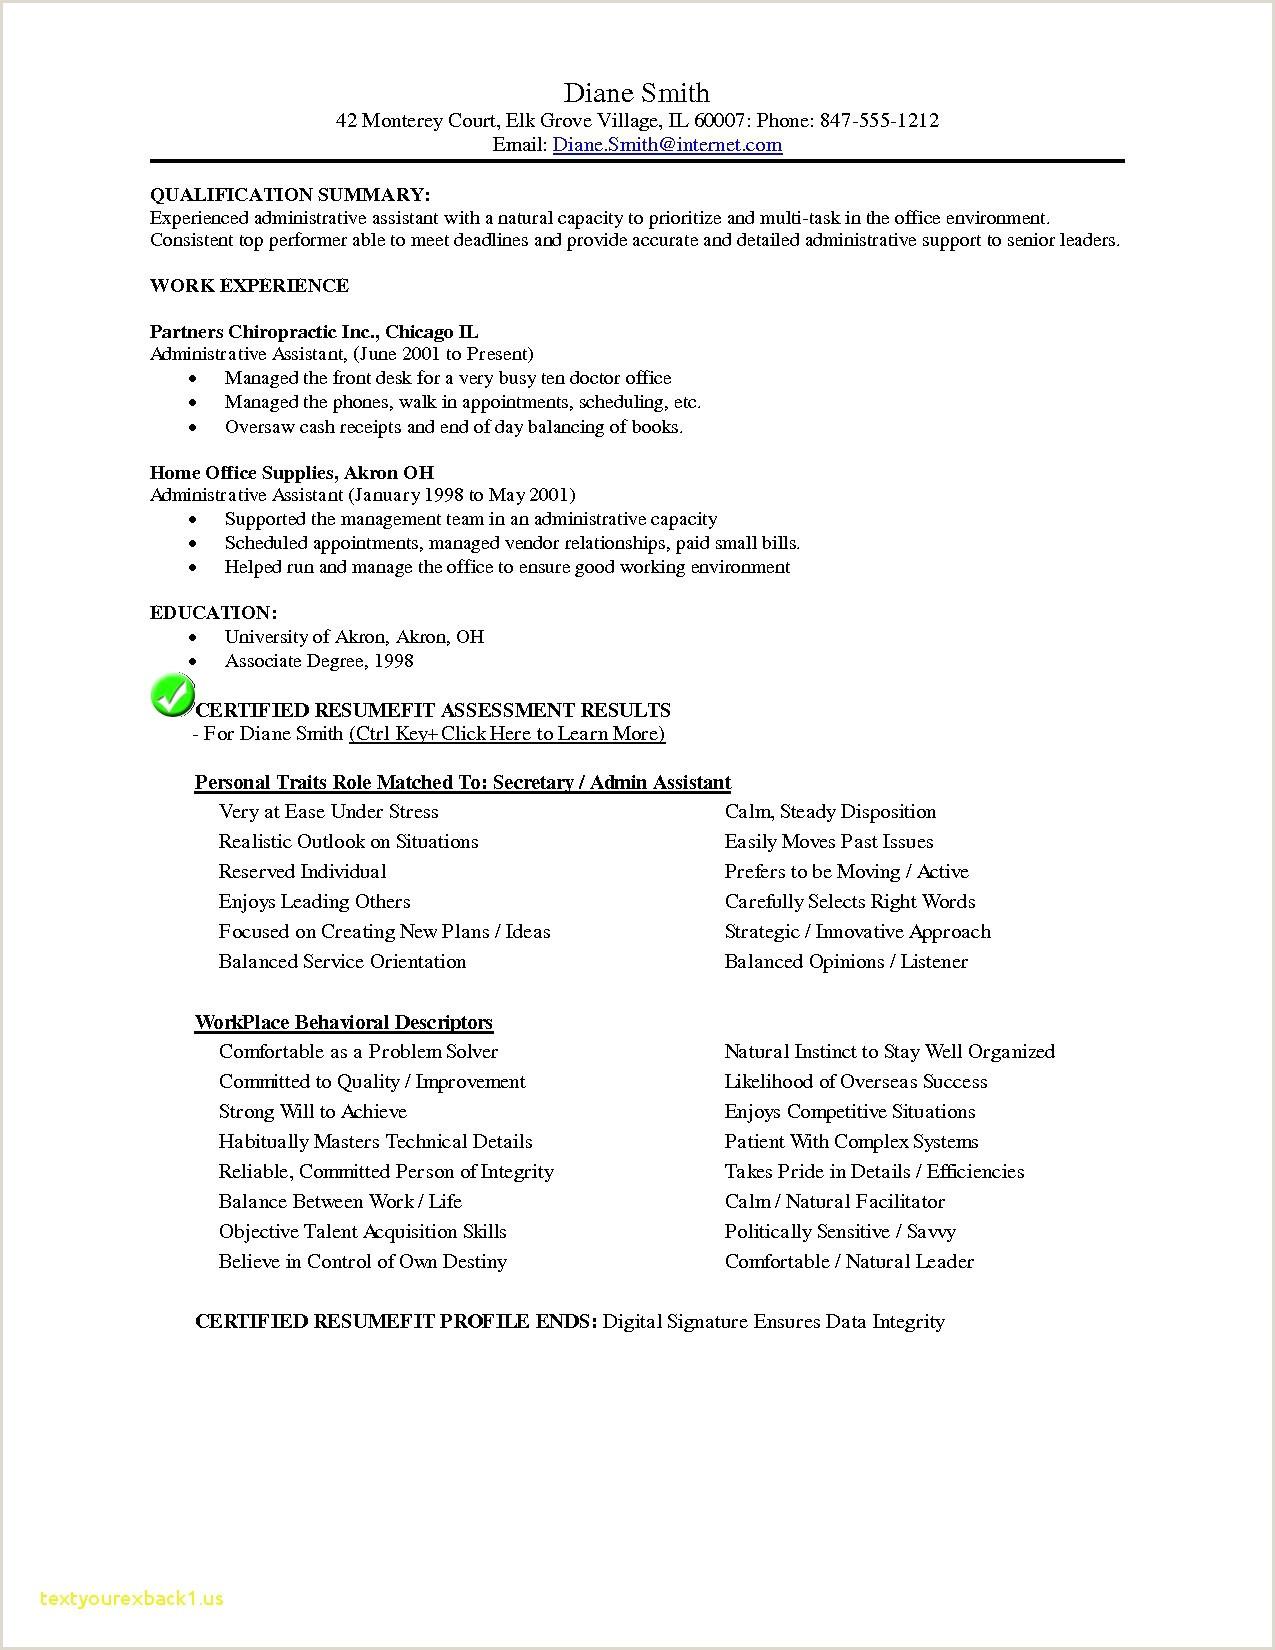 Resume for Secretary Creative Resume Sample Examples Free Creative Resume